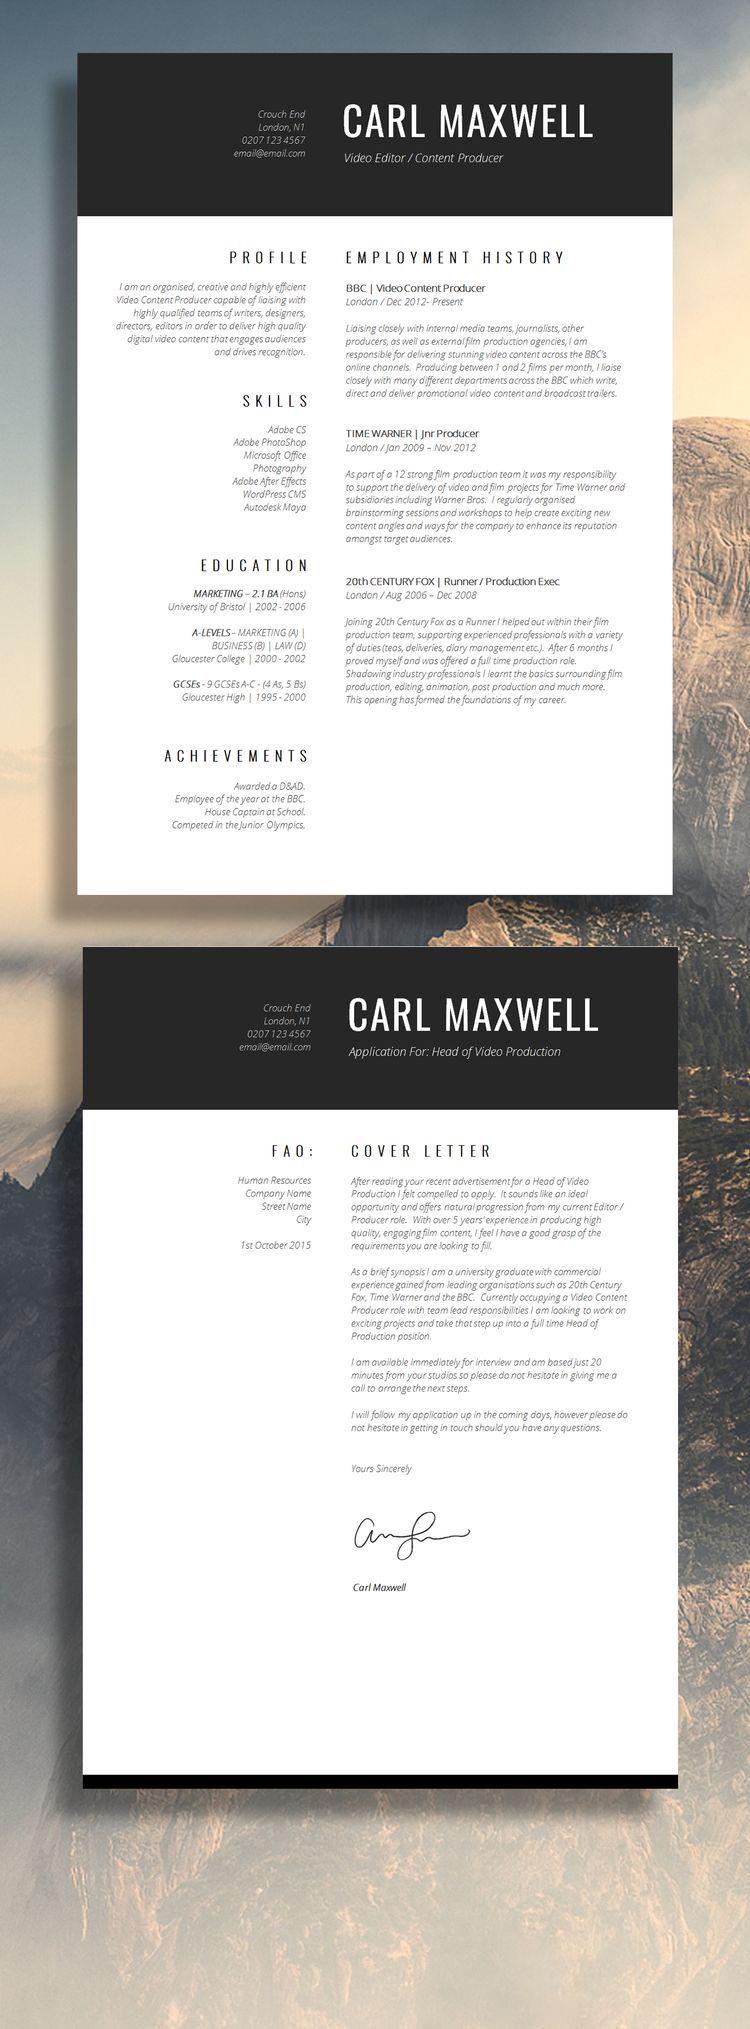 Another Cover Letter Design Cv Design Resume Design Resume Template Professional